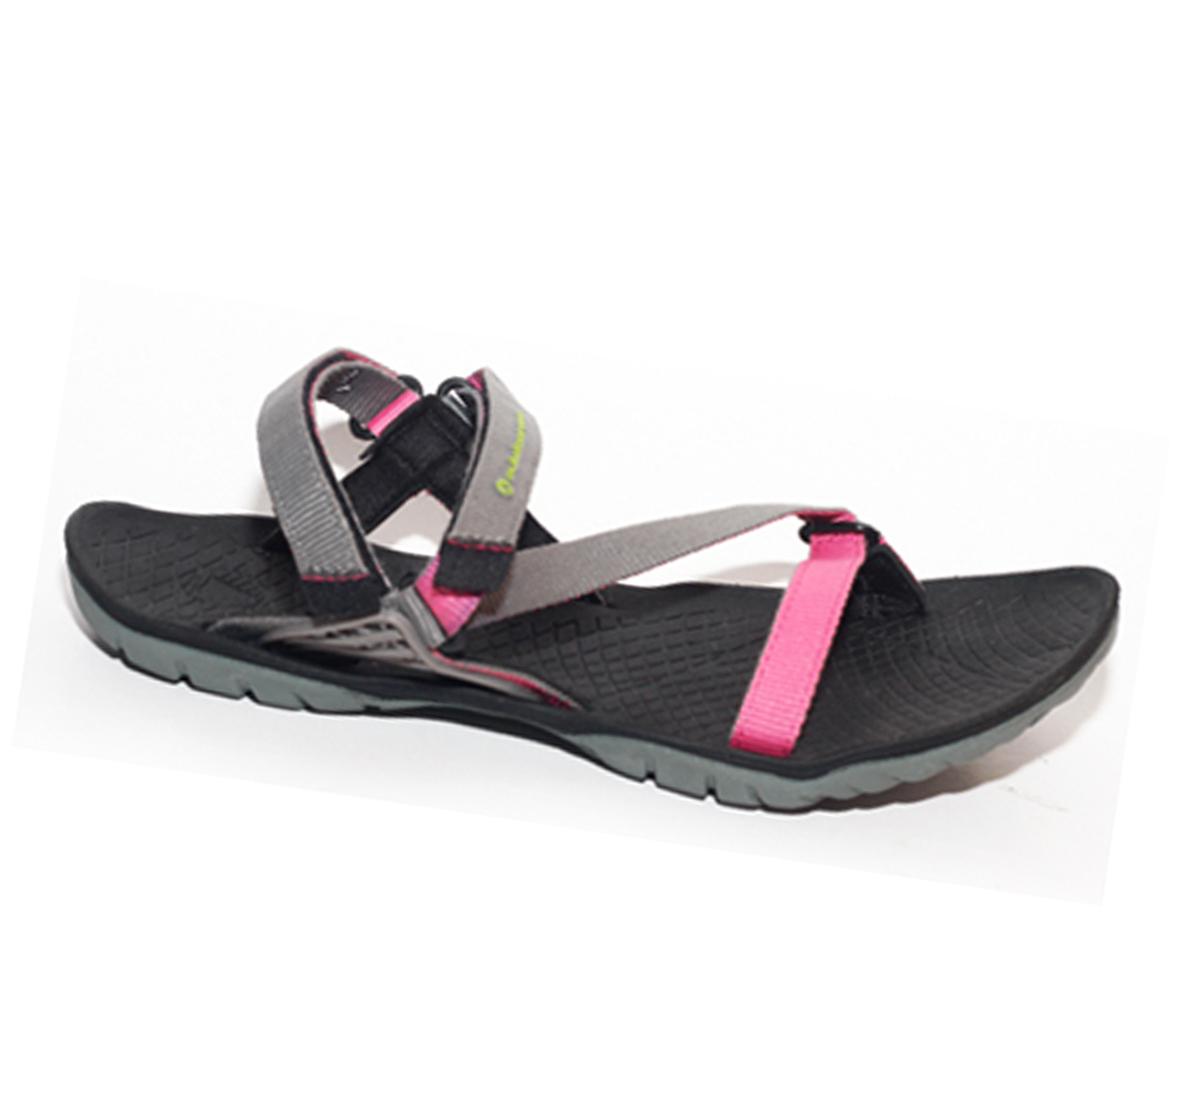 Jual sandal gunung wanita theya ZX Gery, sandal outdoor ...